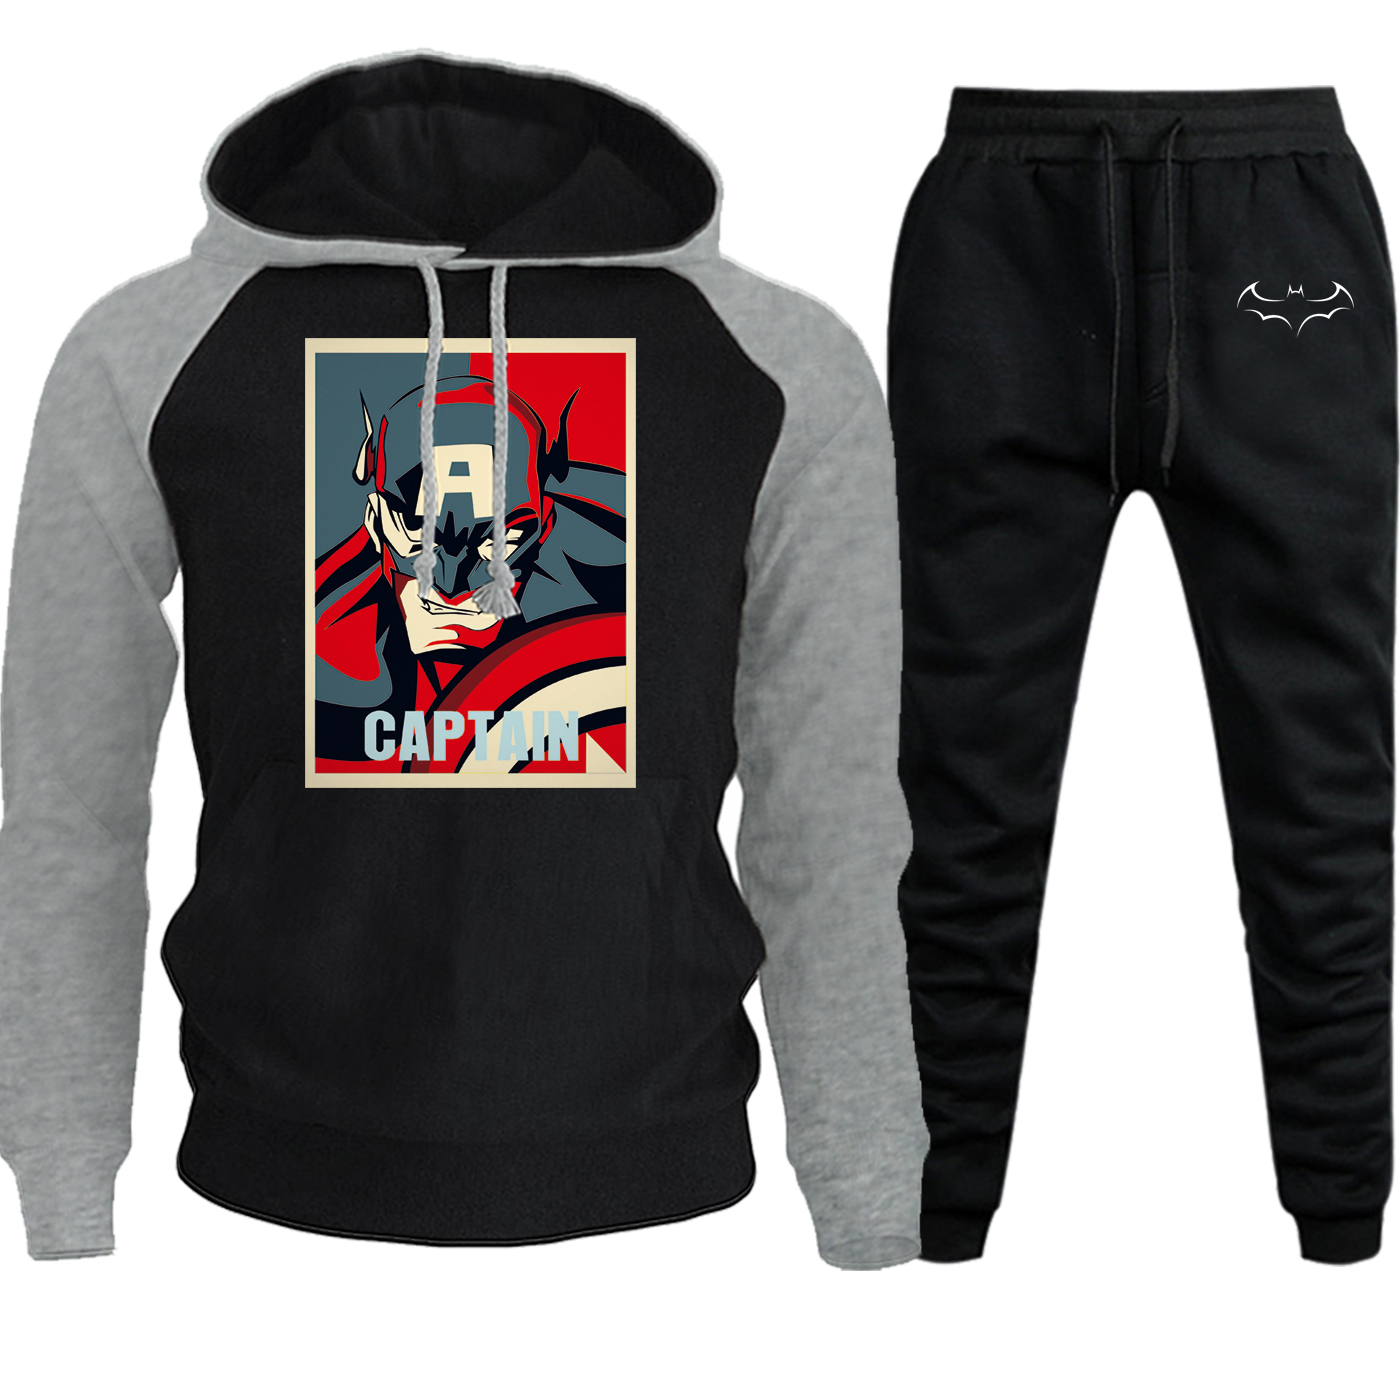 Autumn Winter 2019 New Hoodie Mens Sweatshirts Raglan Batman Hip Hop Superhero Suit Hooded Casual Pullover+Pants 2 Piece Set